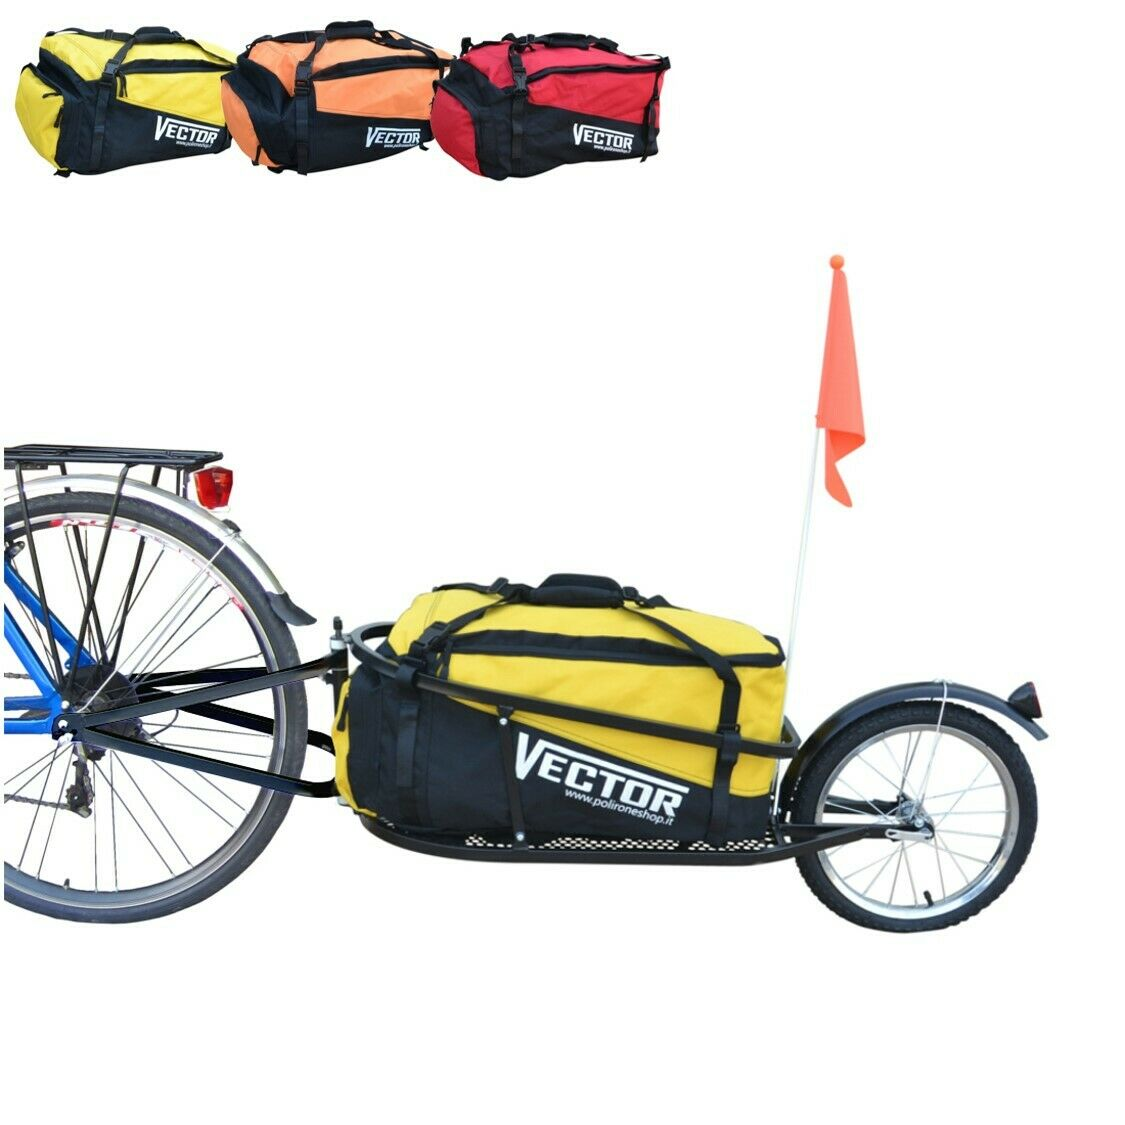 Vector remolque para bicicleta remolque para cargas remolque monociclo remolque equipaje con bolso